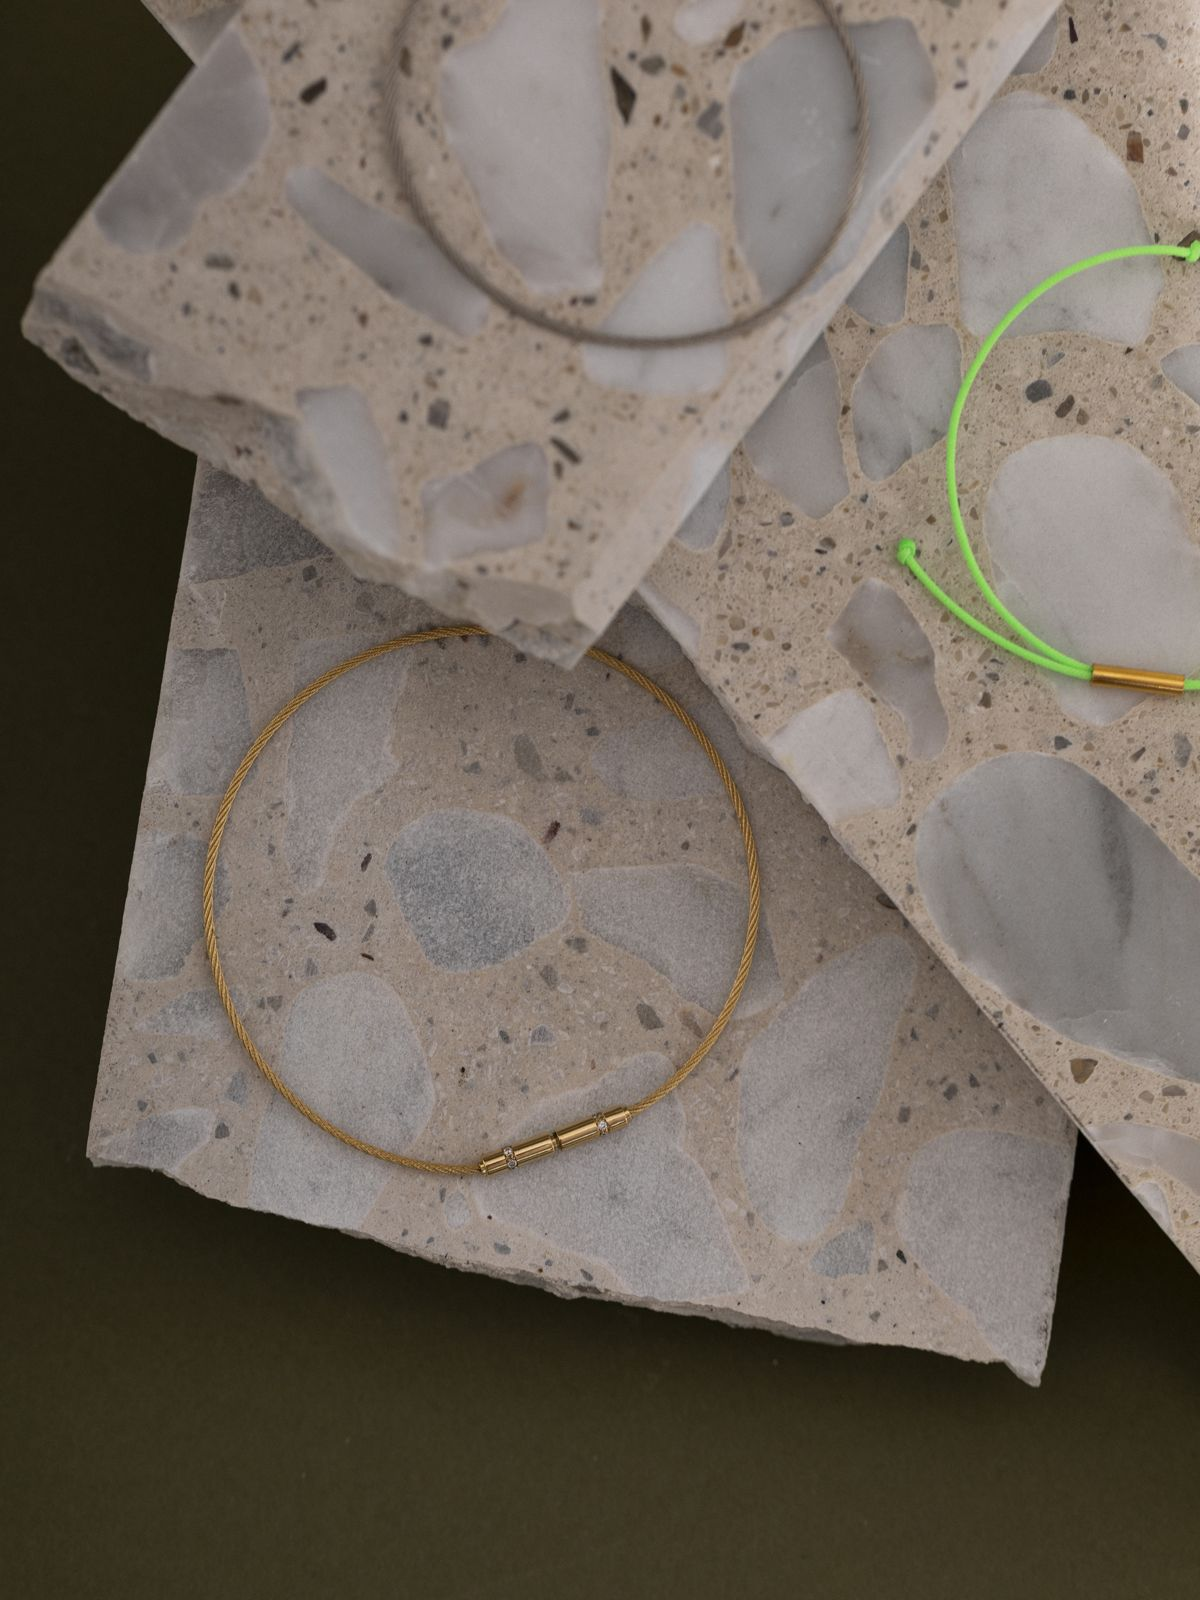 _ Baumwoll-Nylon-Faden _ Sterling Silber oder Sterling Silber 18kt vergoldet _ größenverstellbar _ hand made in Germany